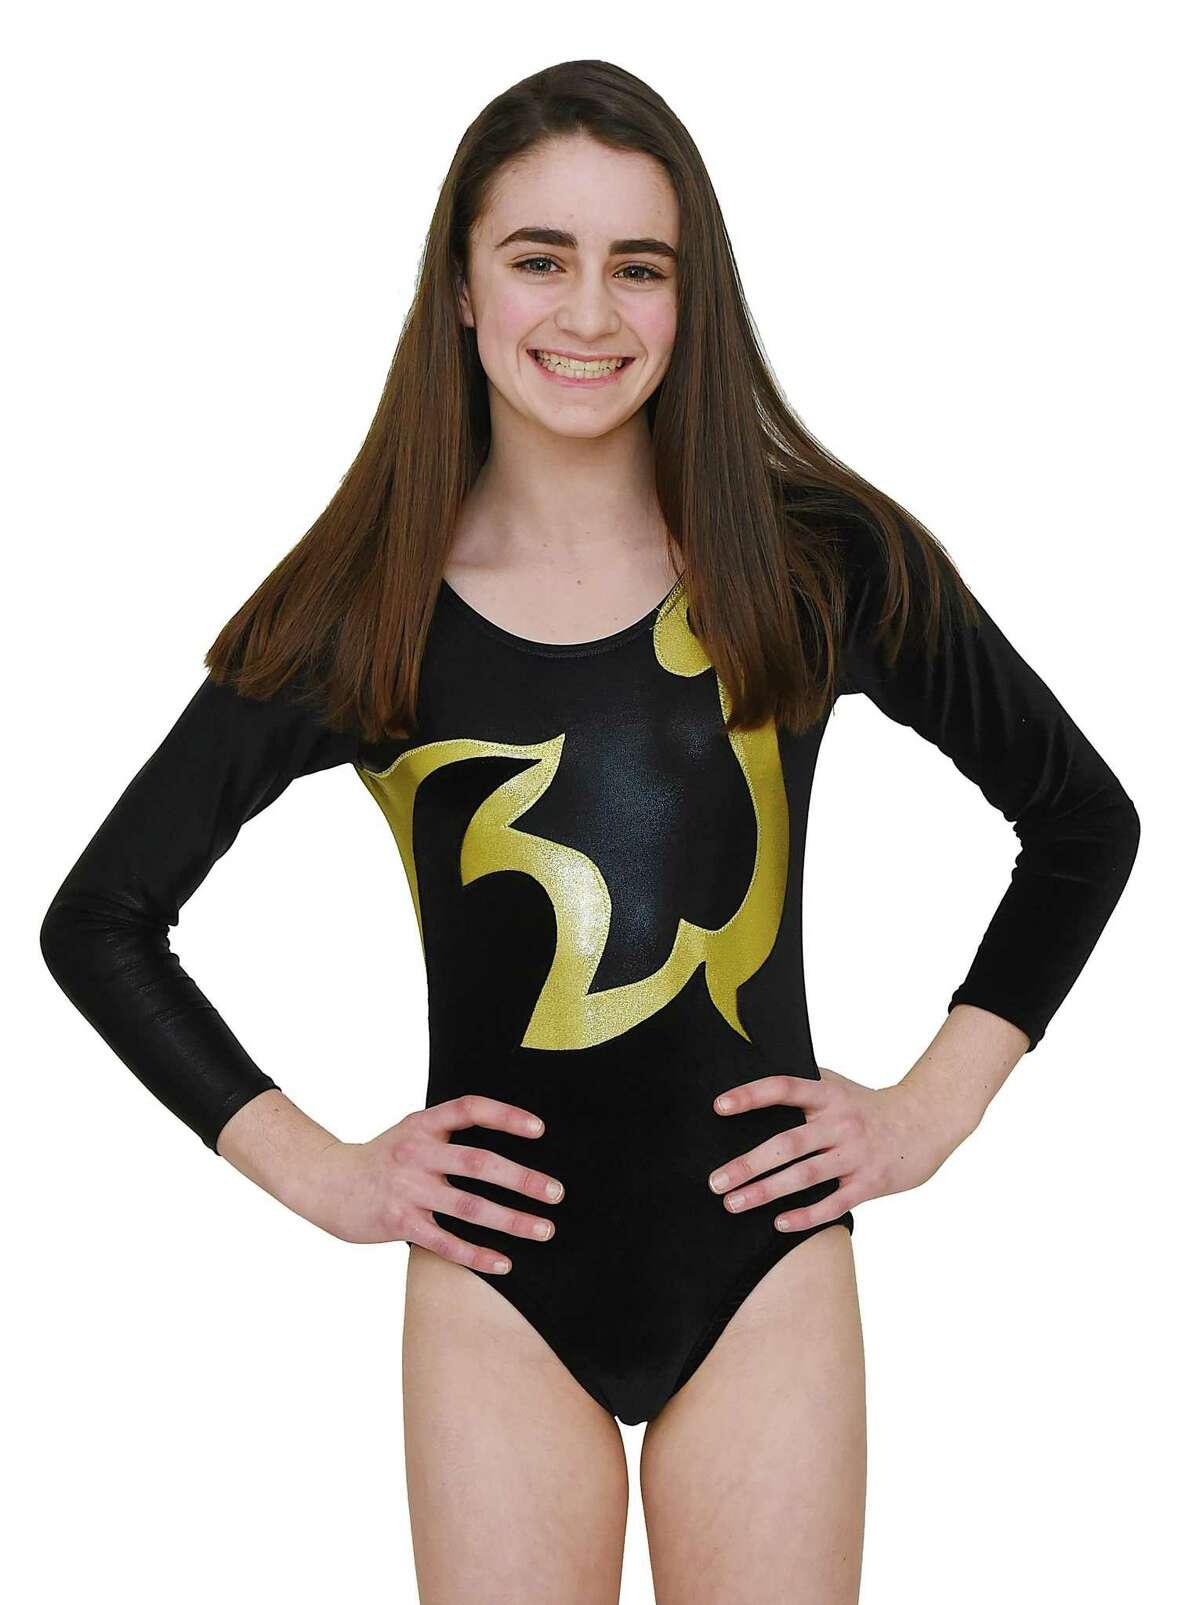 Catherine Burns Jonathan Law High School All-Area Gymnastics March 25, 2018